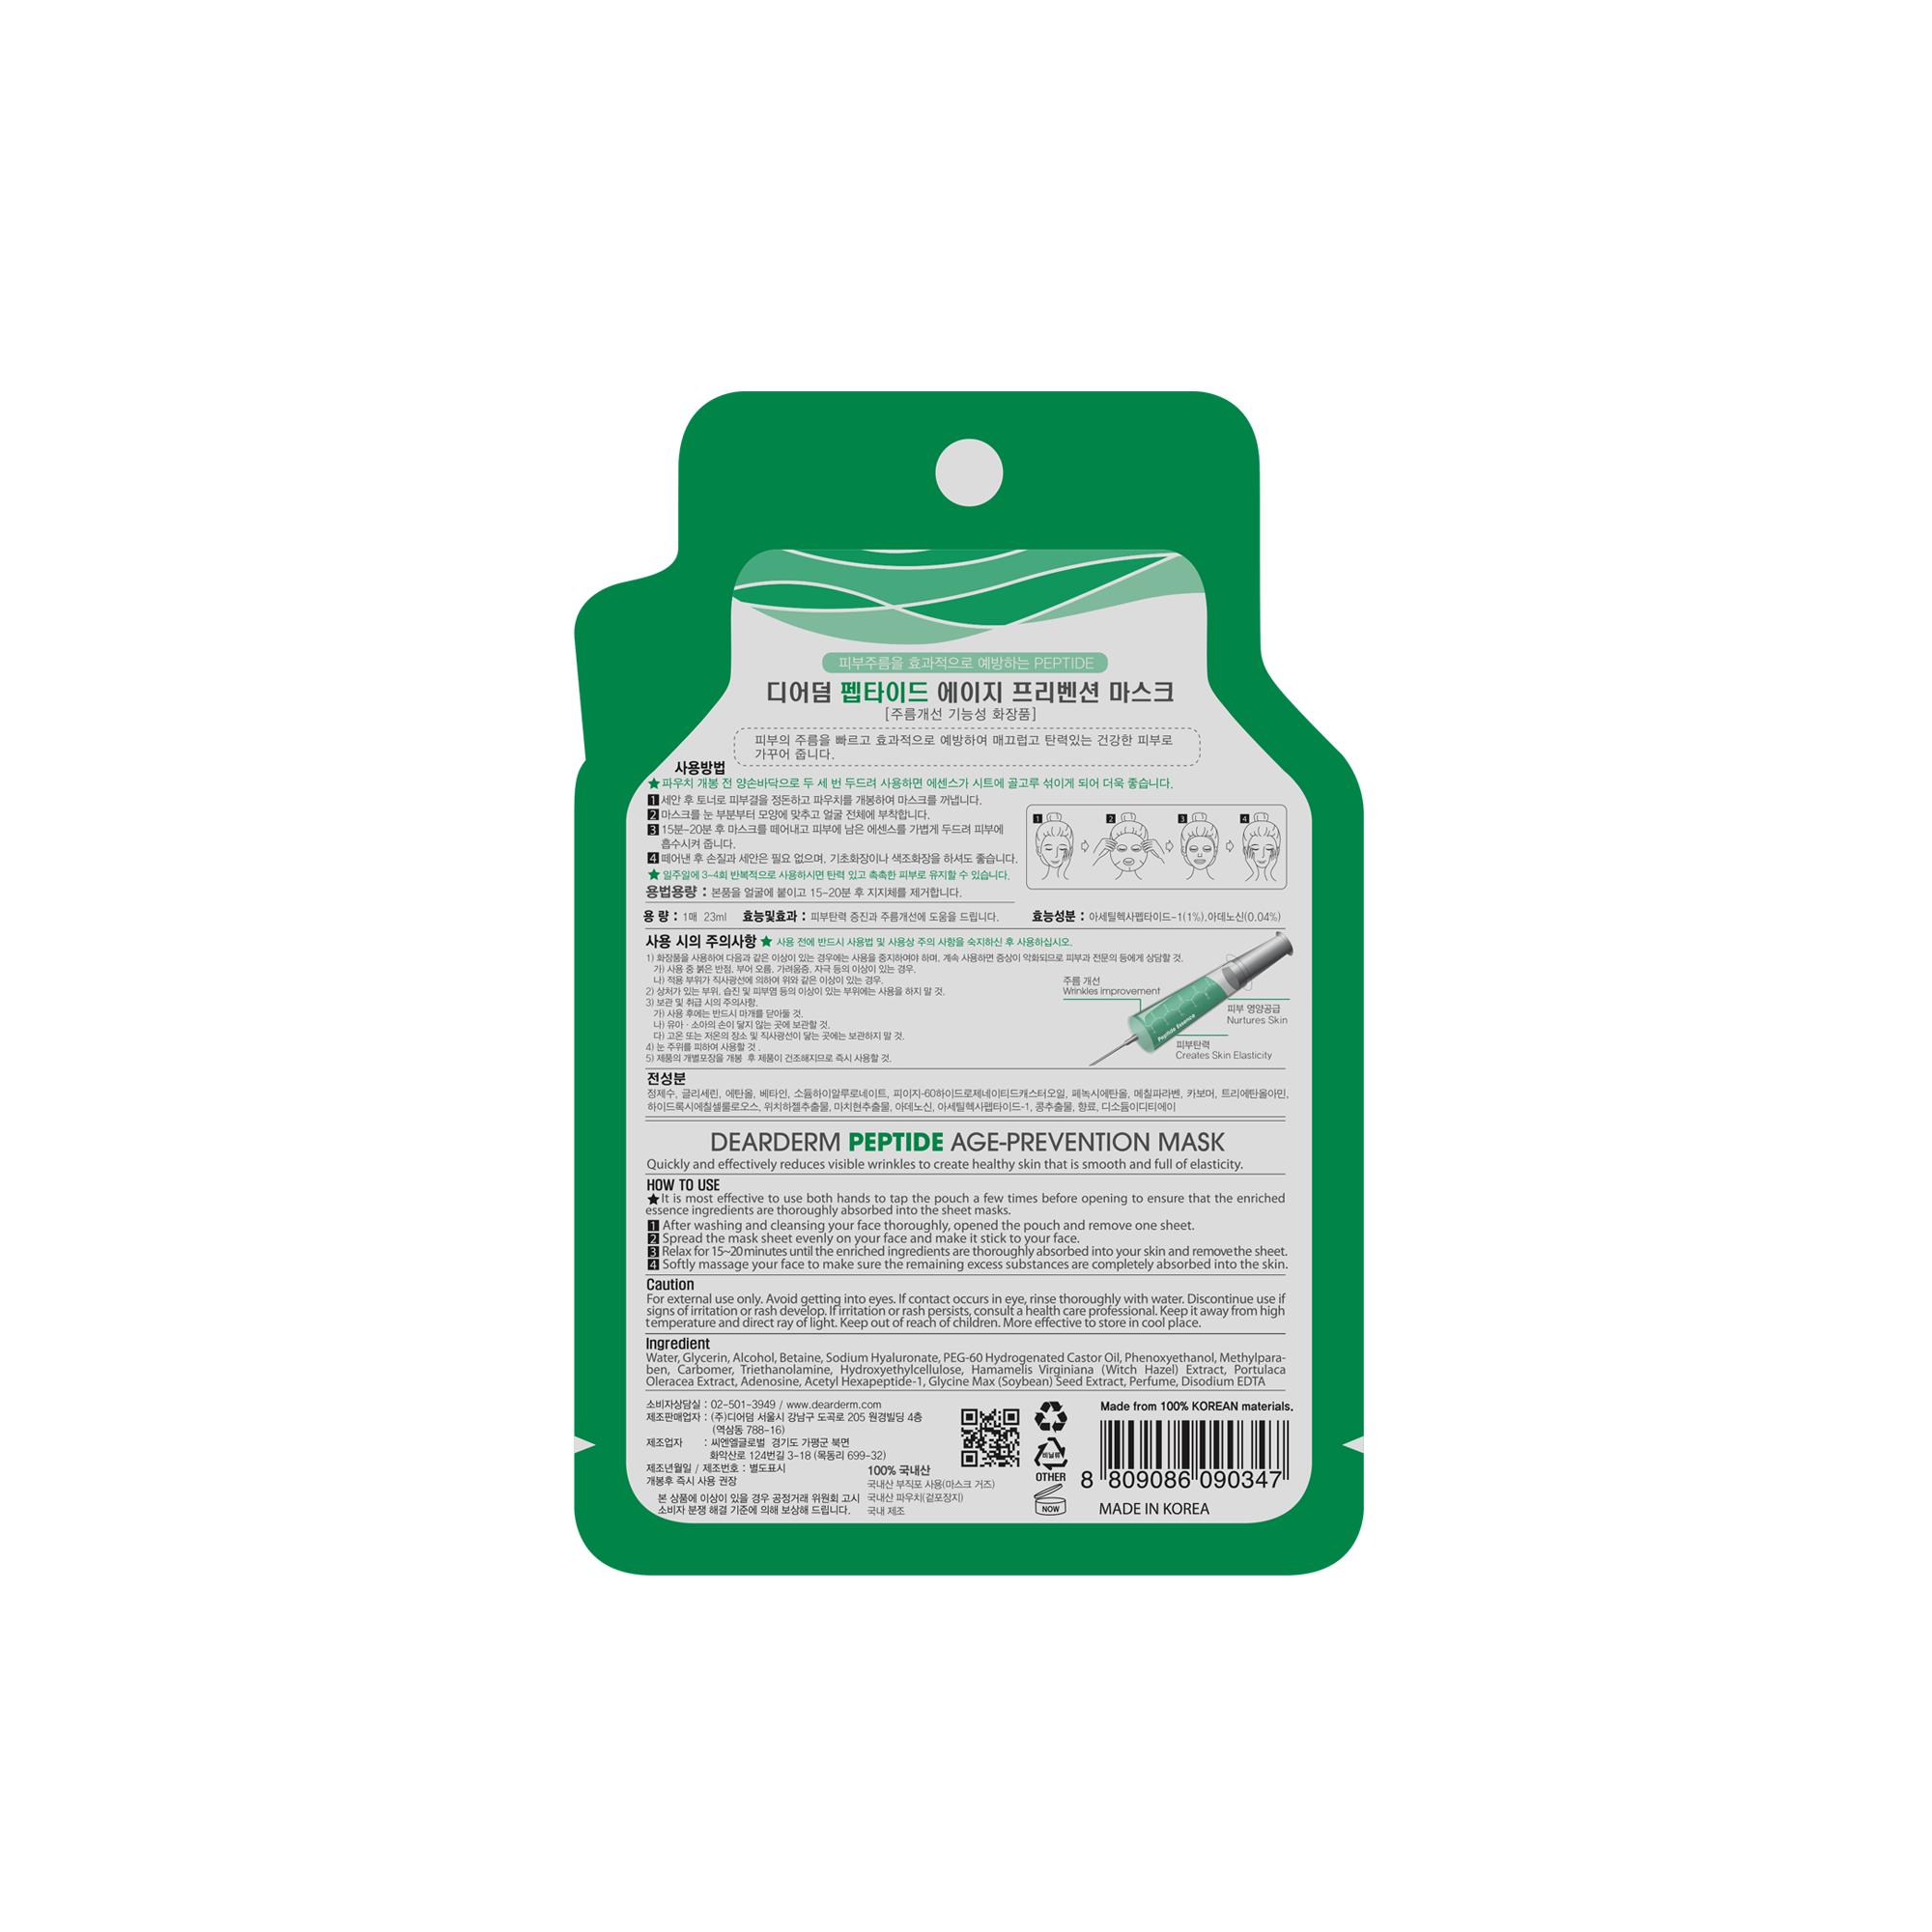 Dearderm Peptide Age-Prevention Mask (10 pcs) Source Naturals, Skin Eternal, Hyaluronic Serum, 1 fl oz (pack of 3)